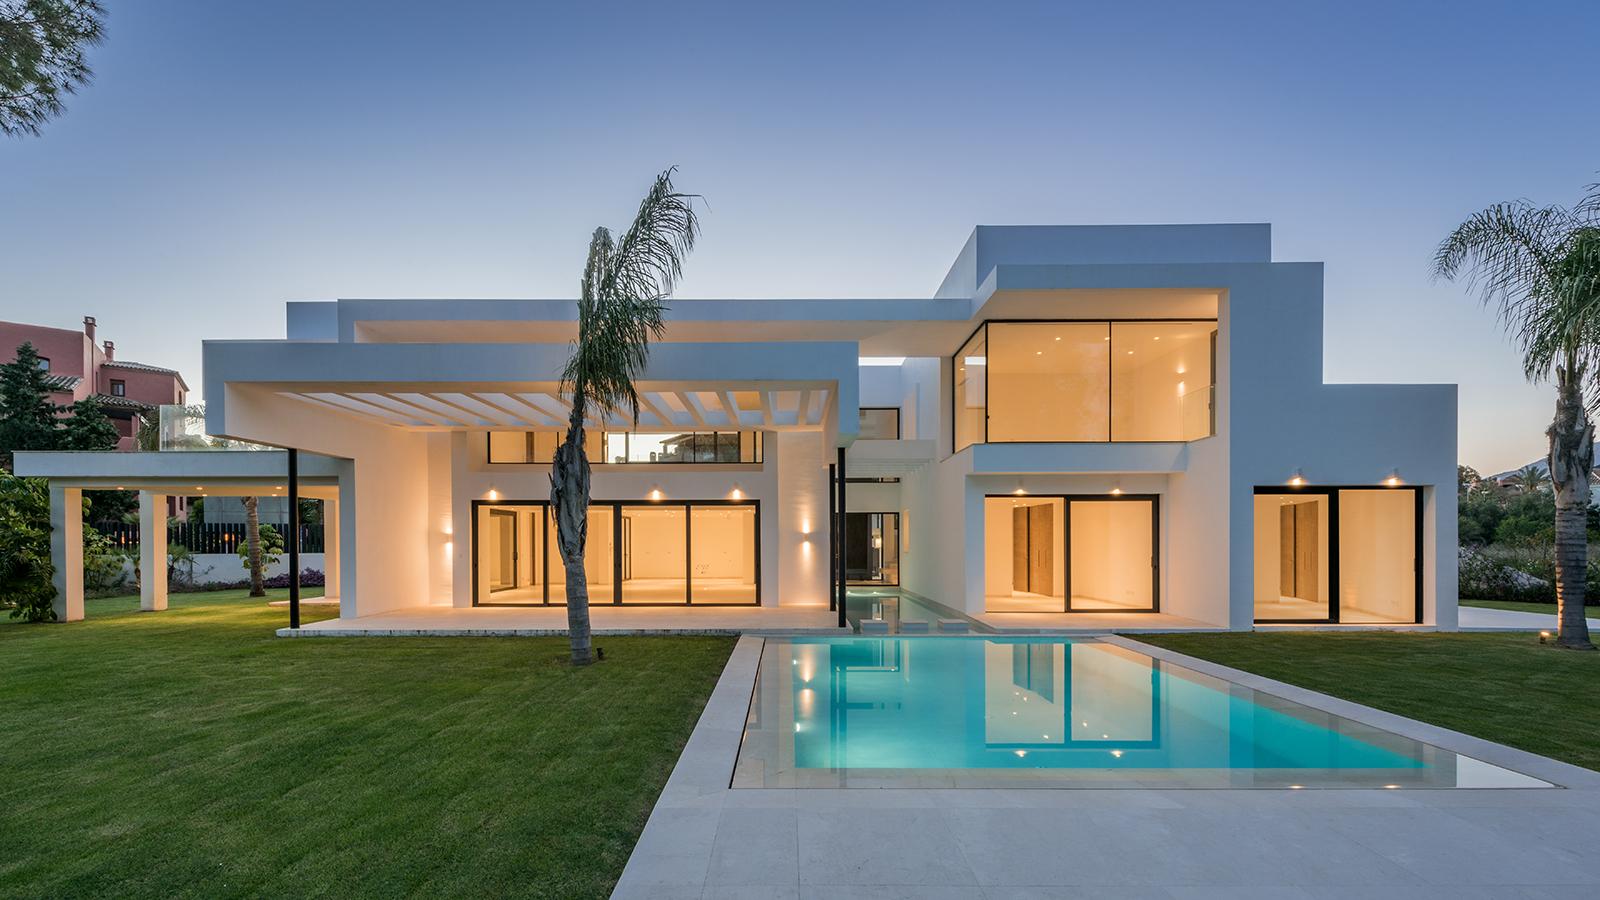 Superb Contemporary Villa close to Sea and Golf in Casasola-Guadalmina Baja